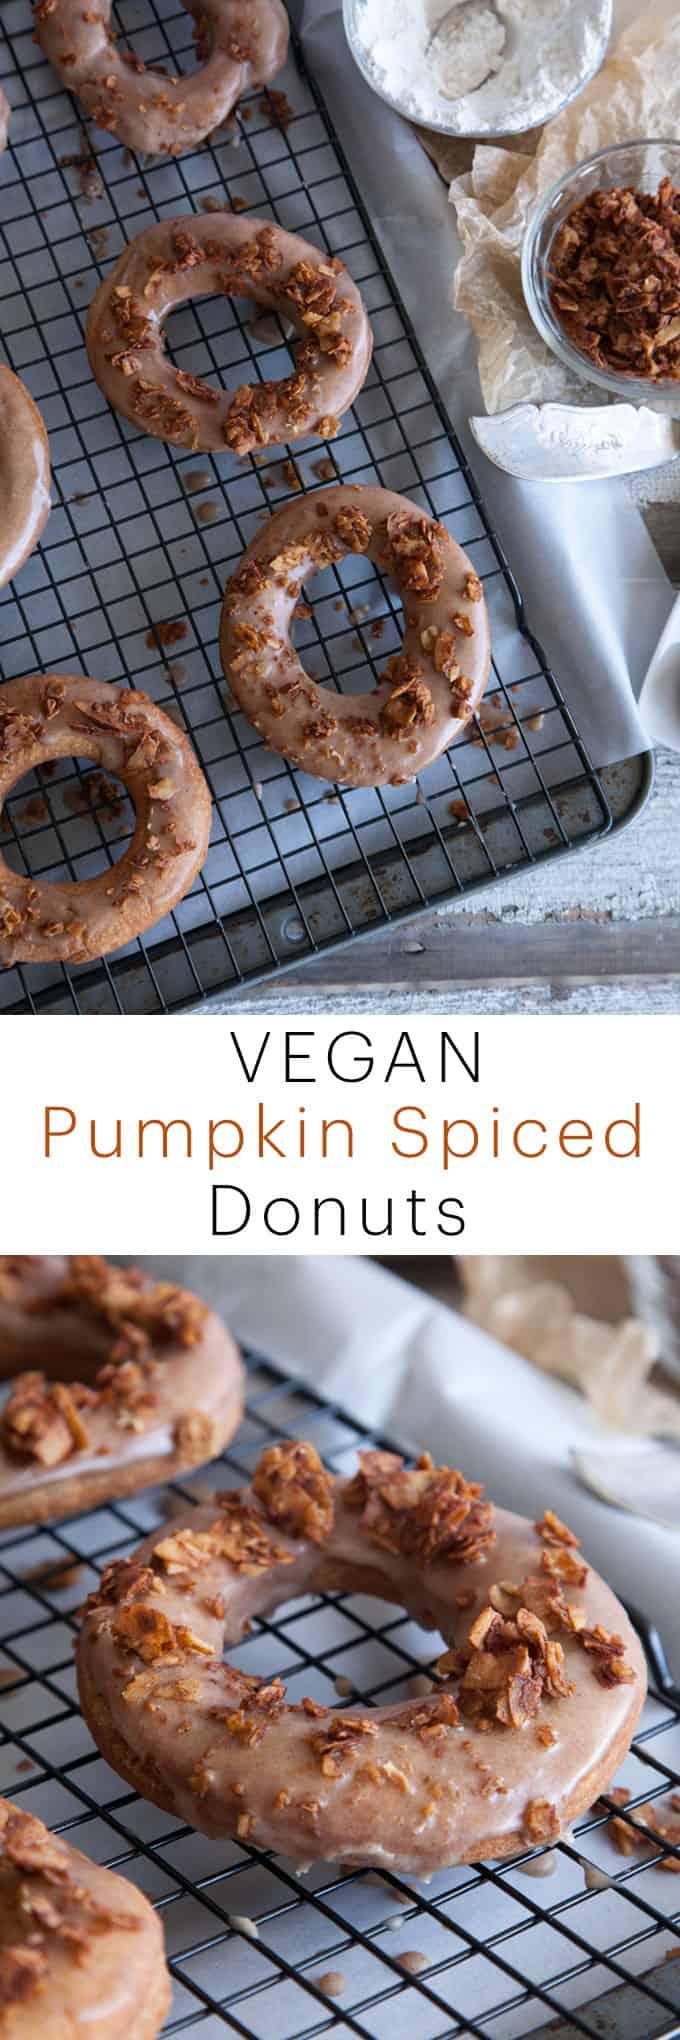 egan Pumpkin Spice Donuts | A Vegan Recipe Inspired by Fall